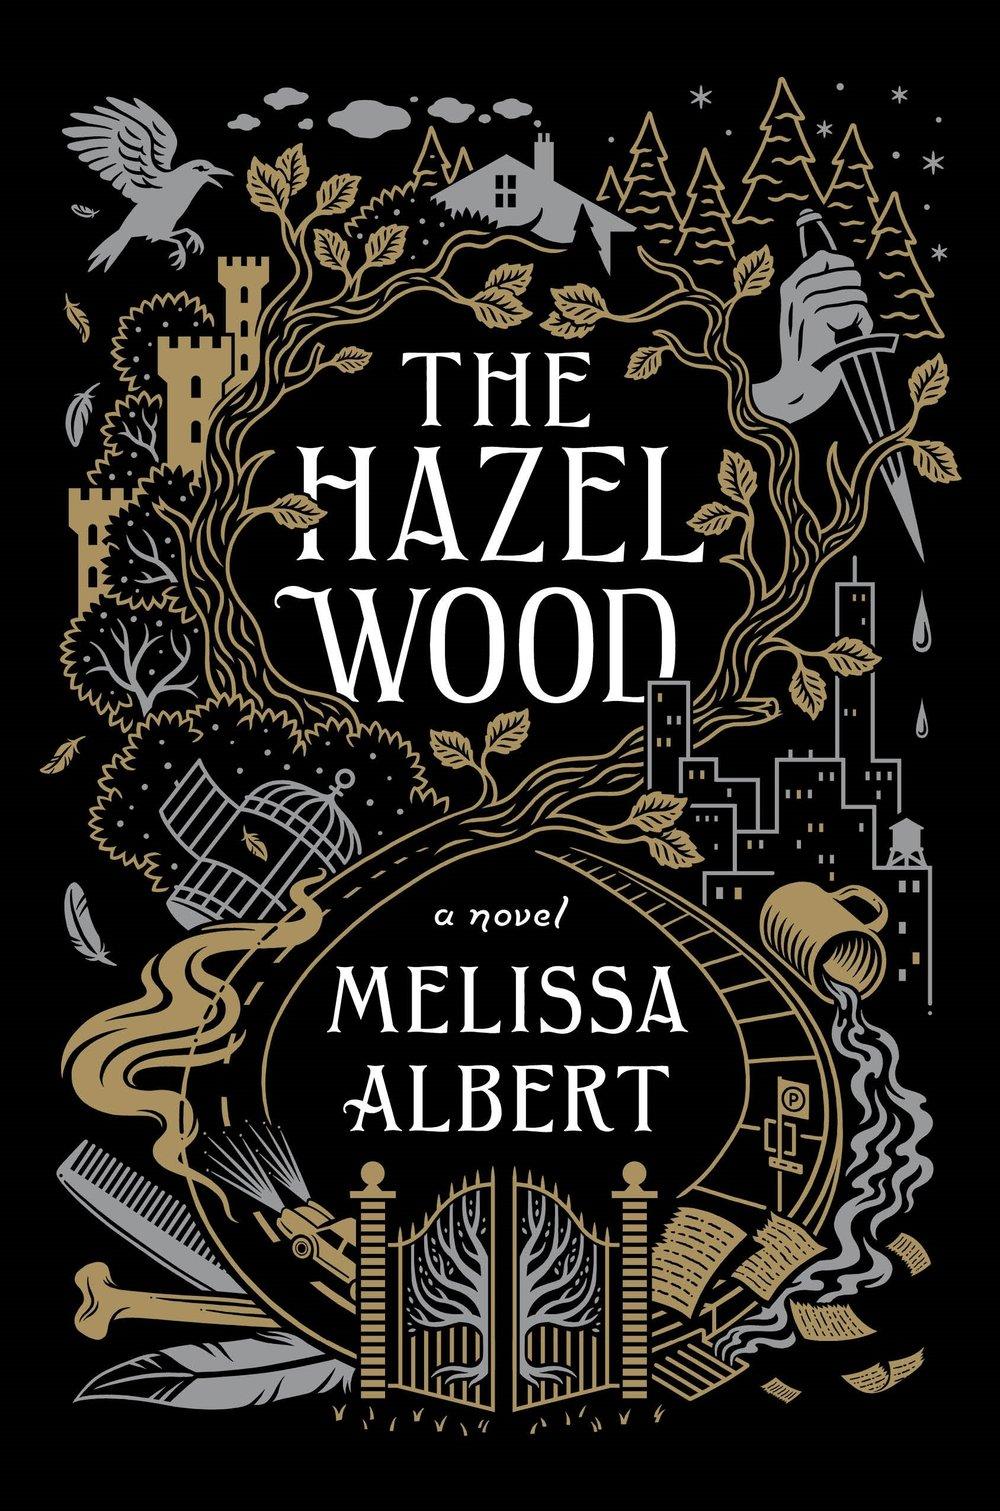 melissa-albert-hazel-wood.jpg